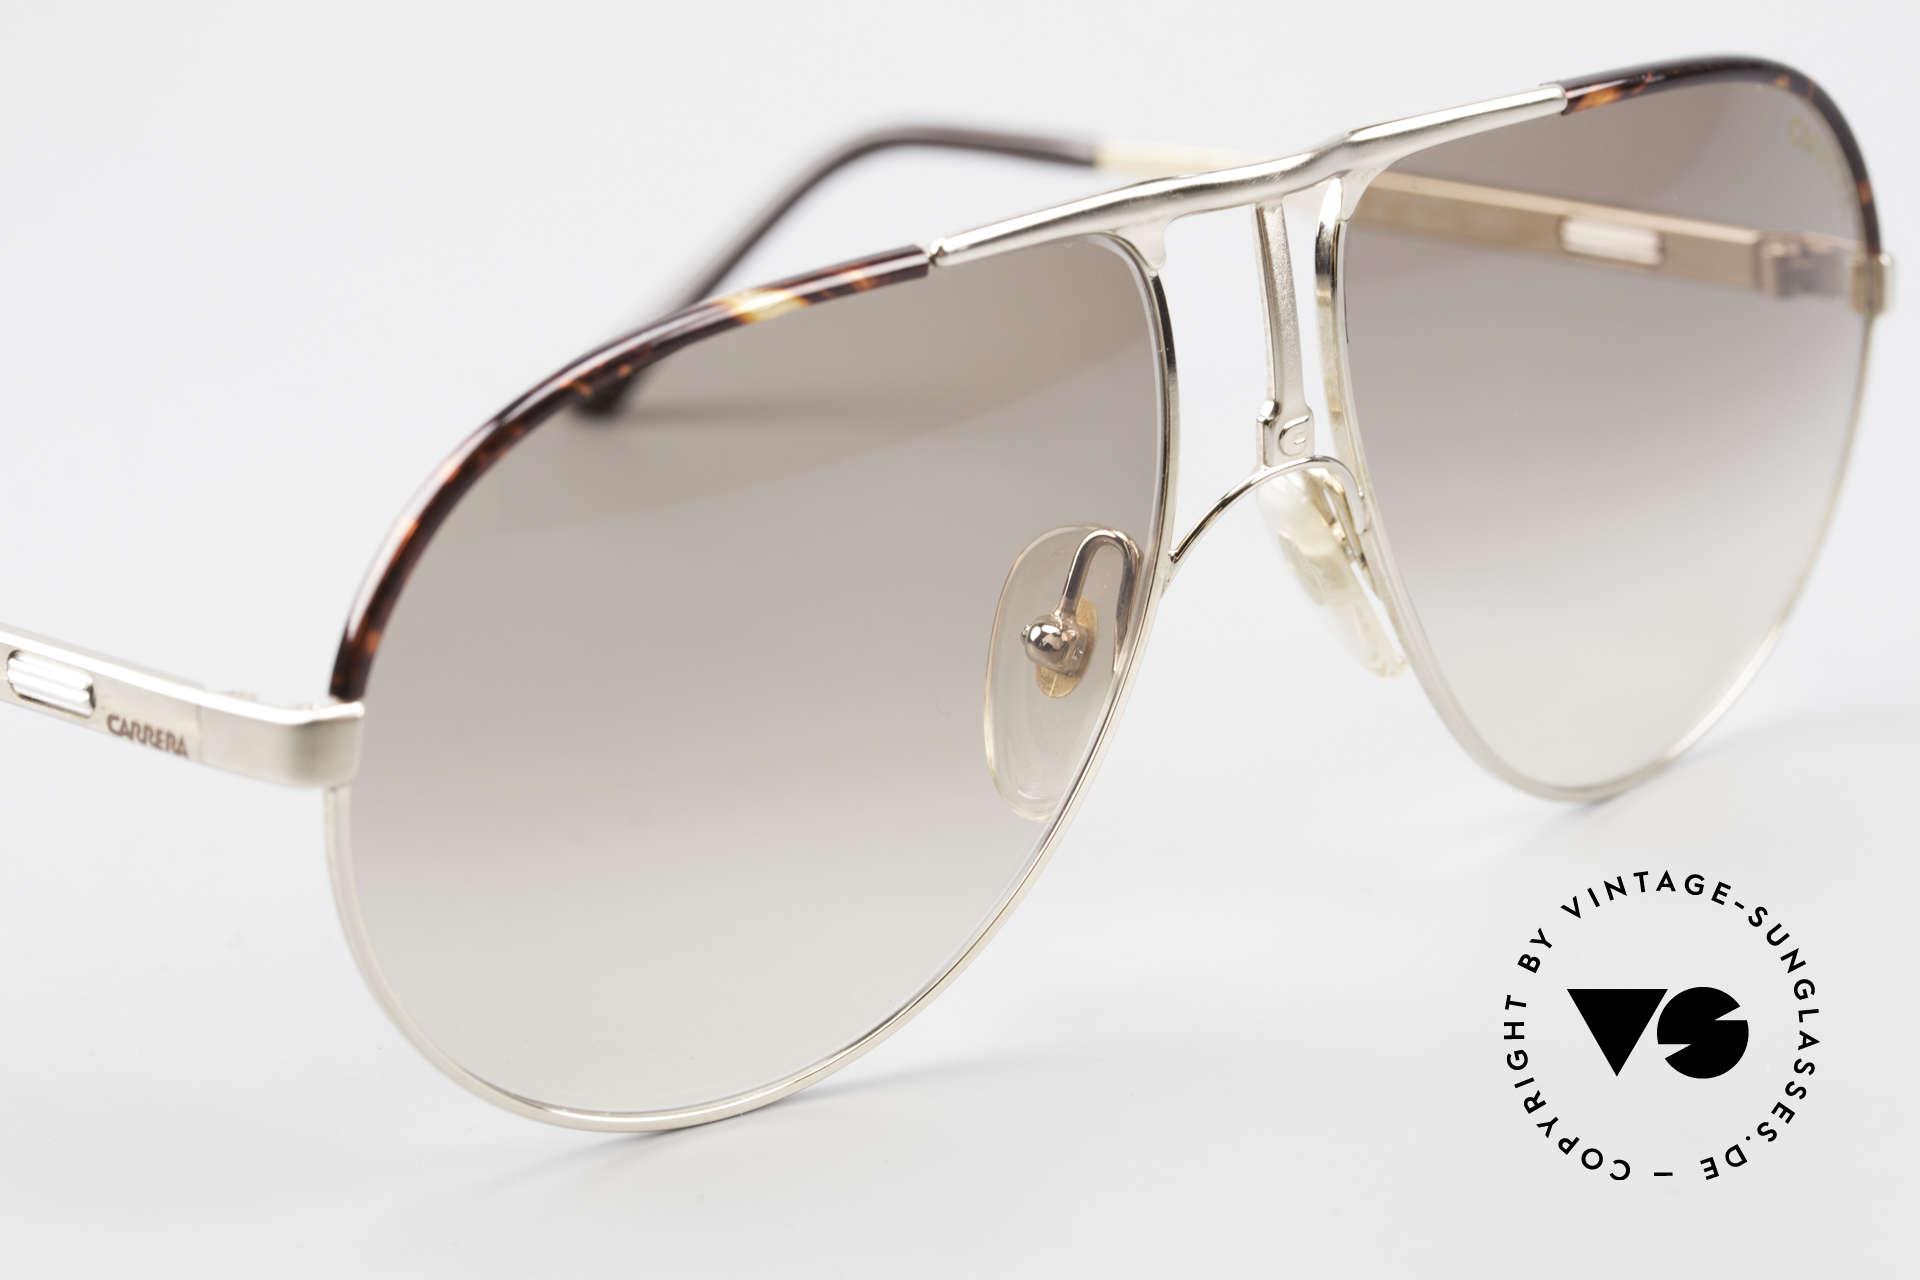 Carrera 5306 Brad Pitt Vintage Sunglasses, unworn; NOS (like all our vintage 'celebrity sunglasses'), Made for Men and Women